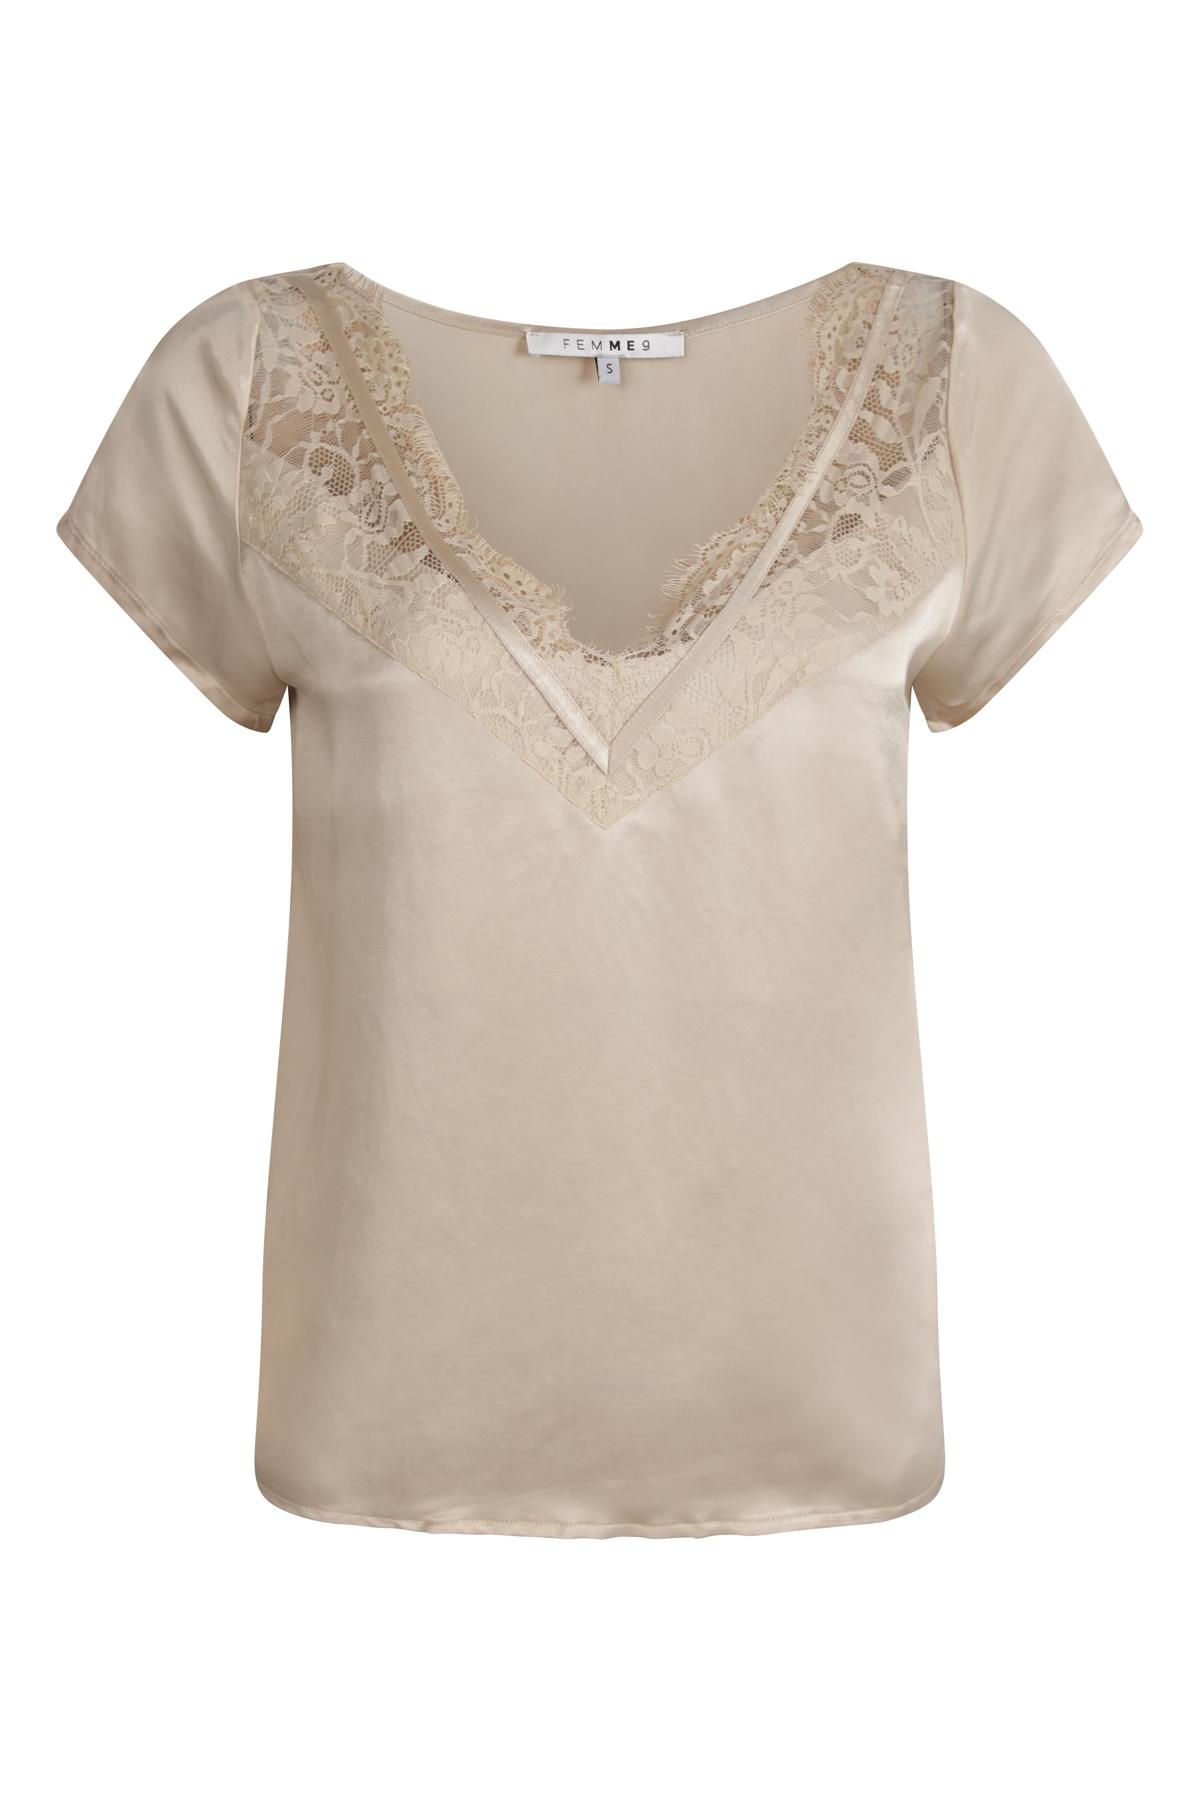 Femme9 Shirt - Top Ecru Gigi